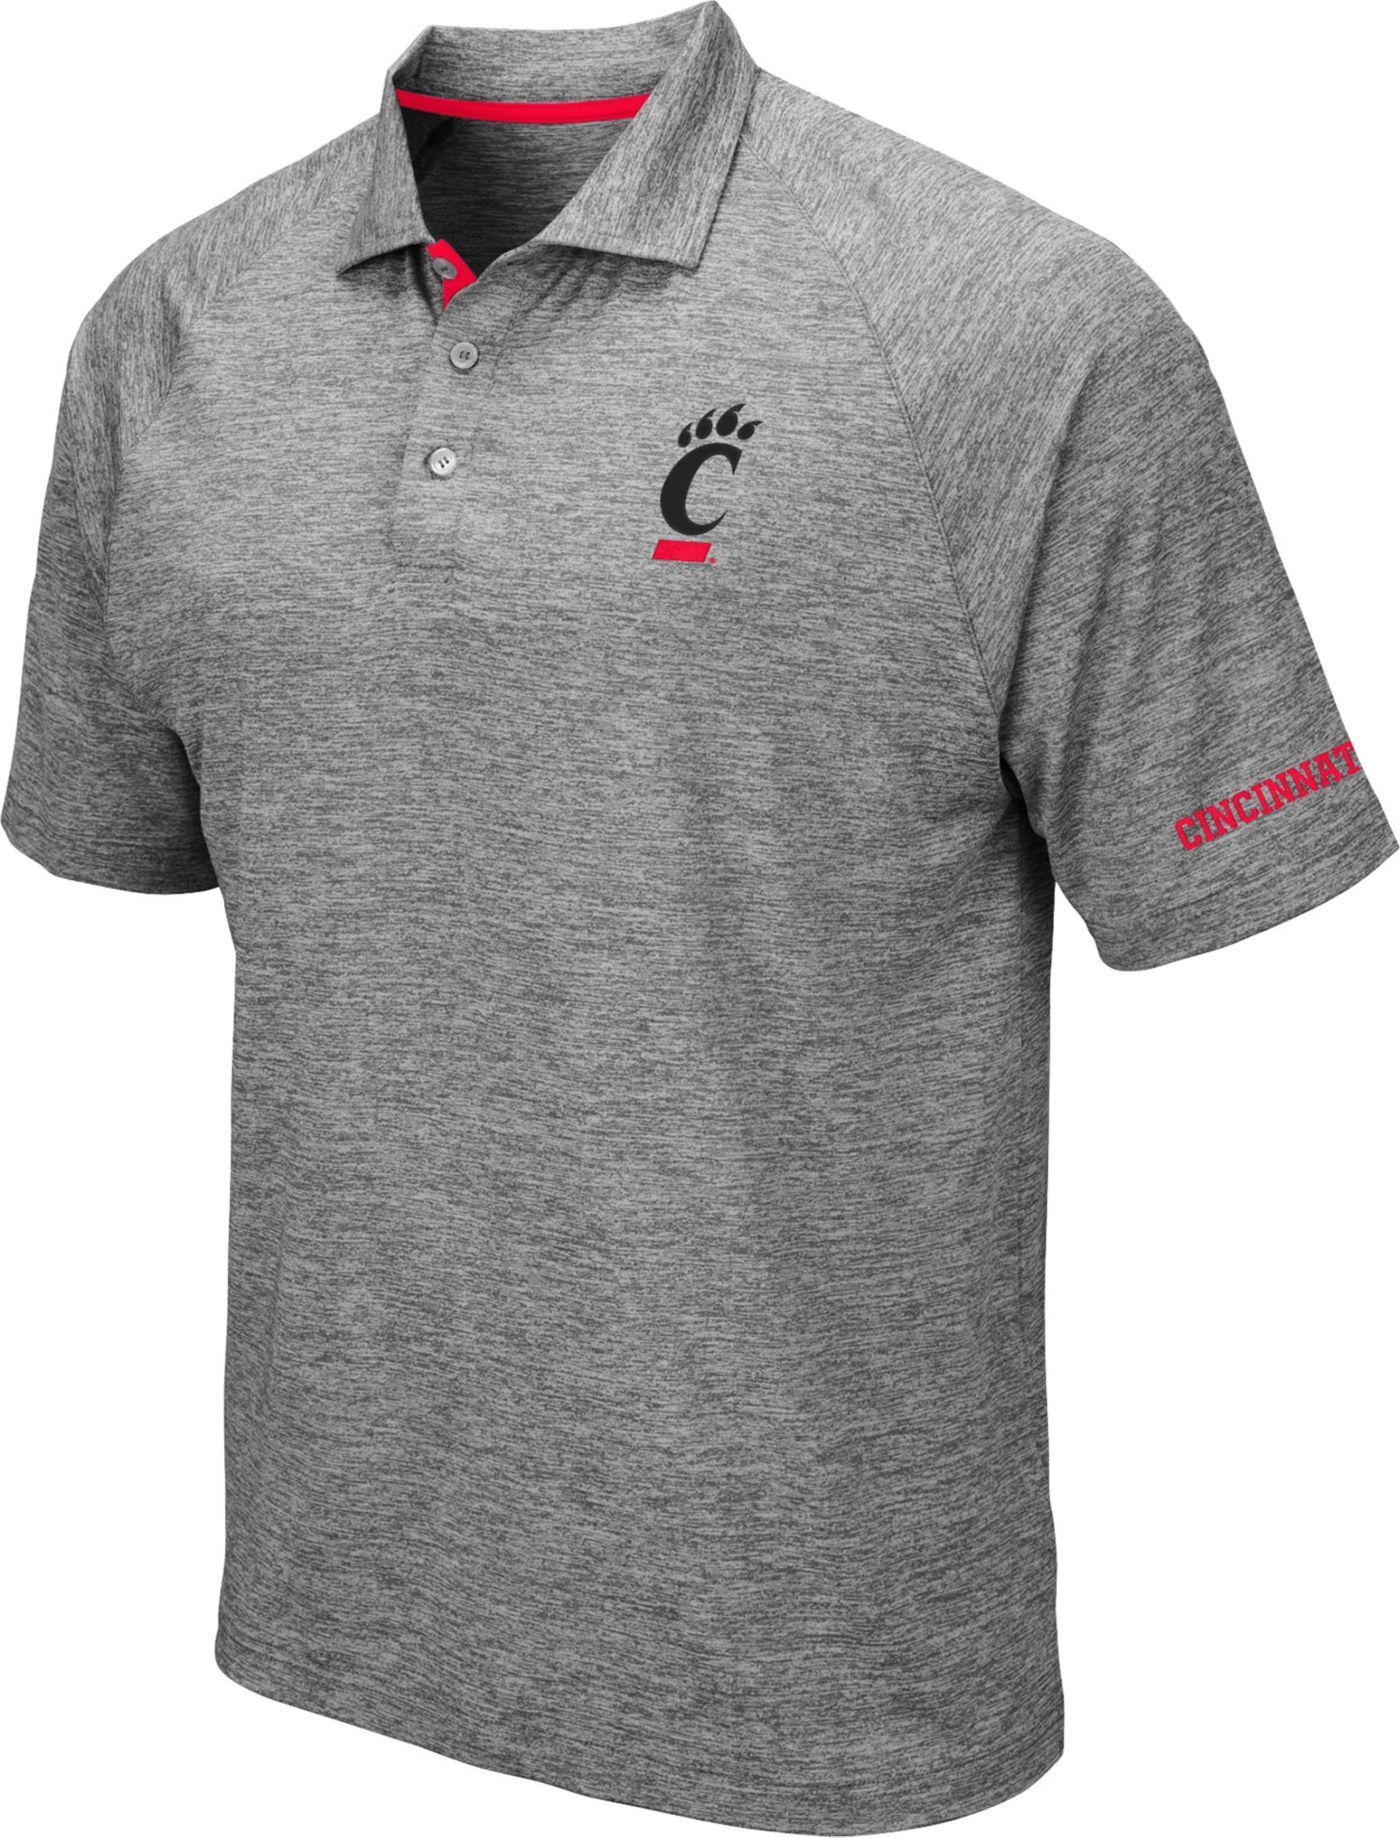 Colosseum Men's Cincinnati Bearcats Grey Chip Shot Polo